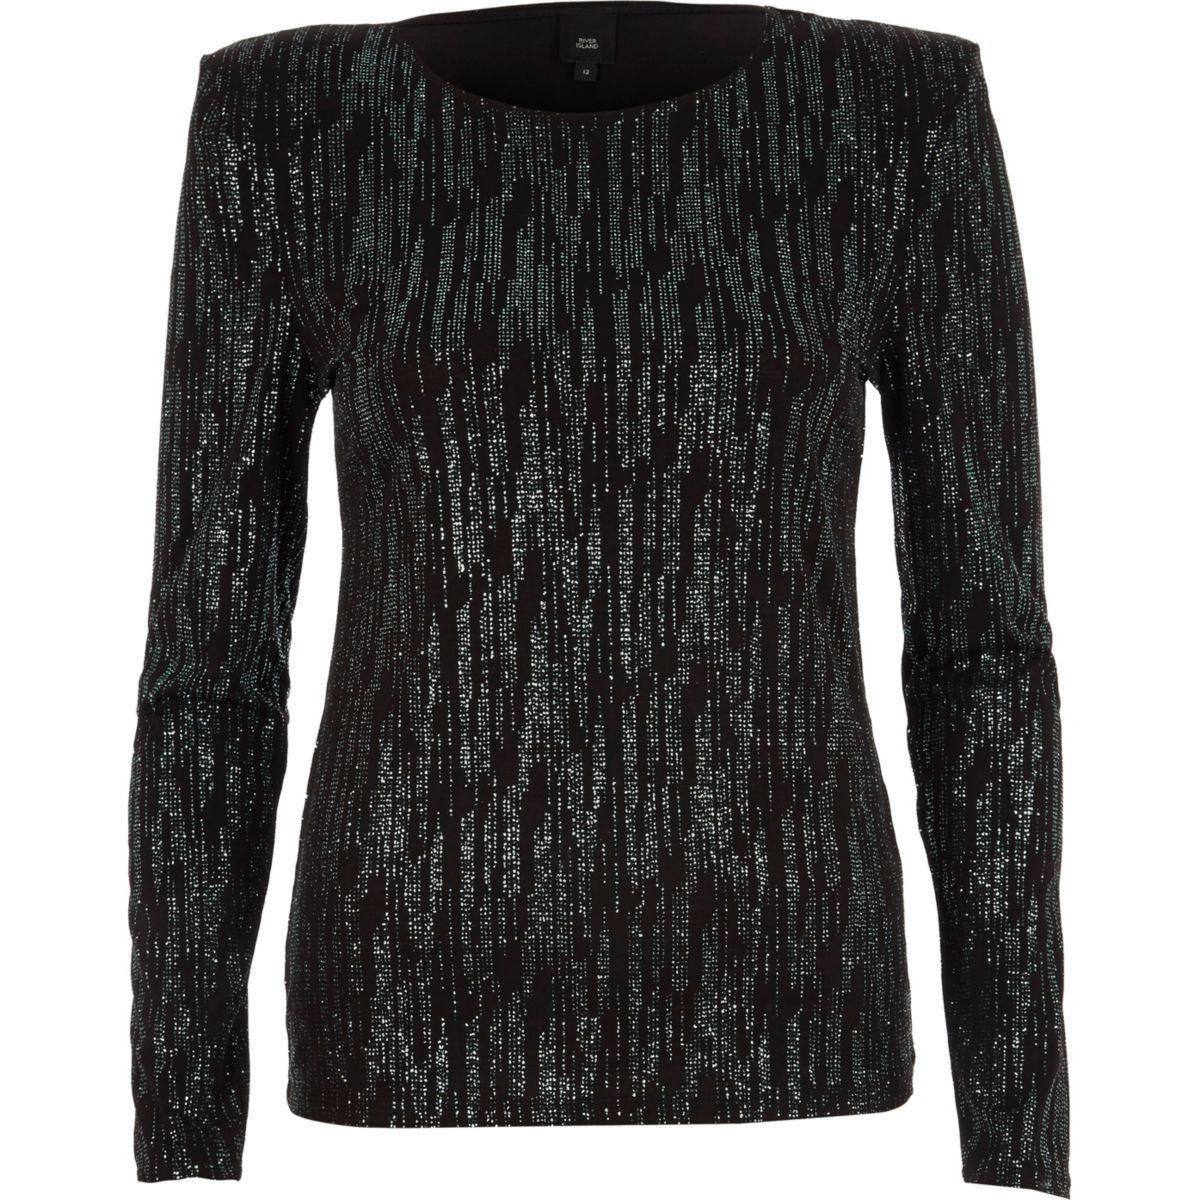 Zwarte glittertop met lange mouwen en schoudervulling